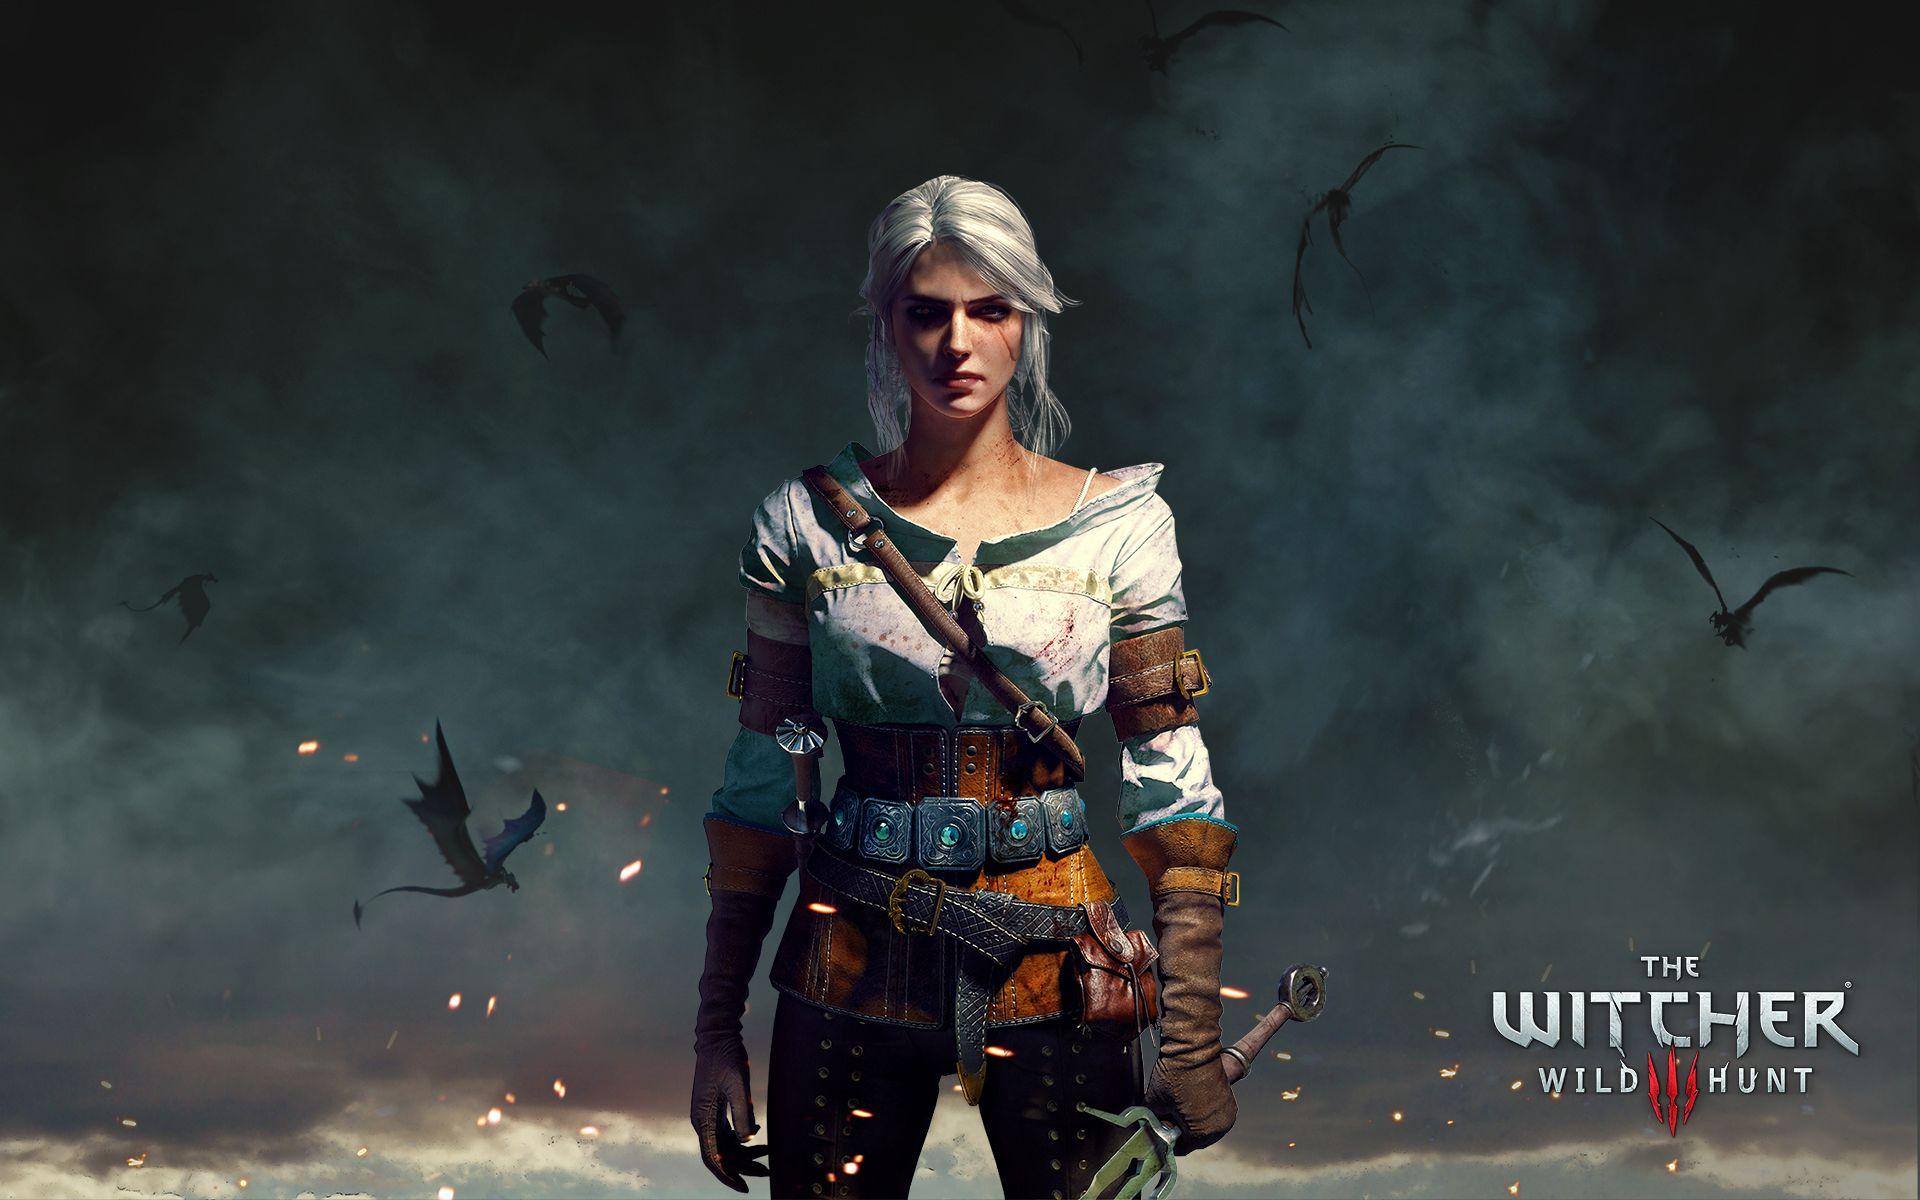 Witcher Ciri, Wallpaper